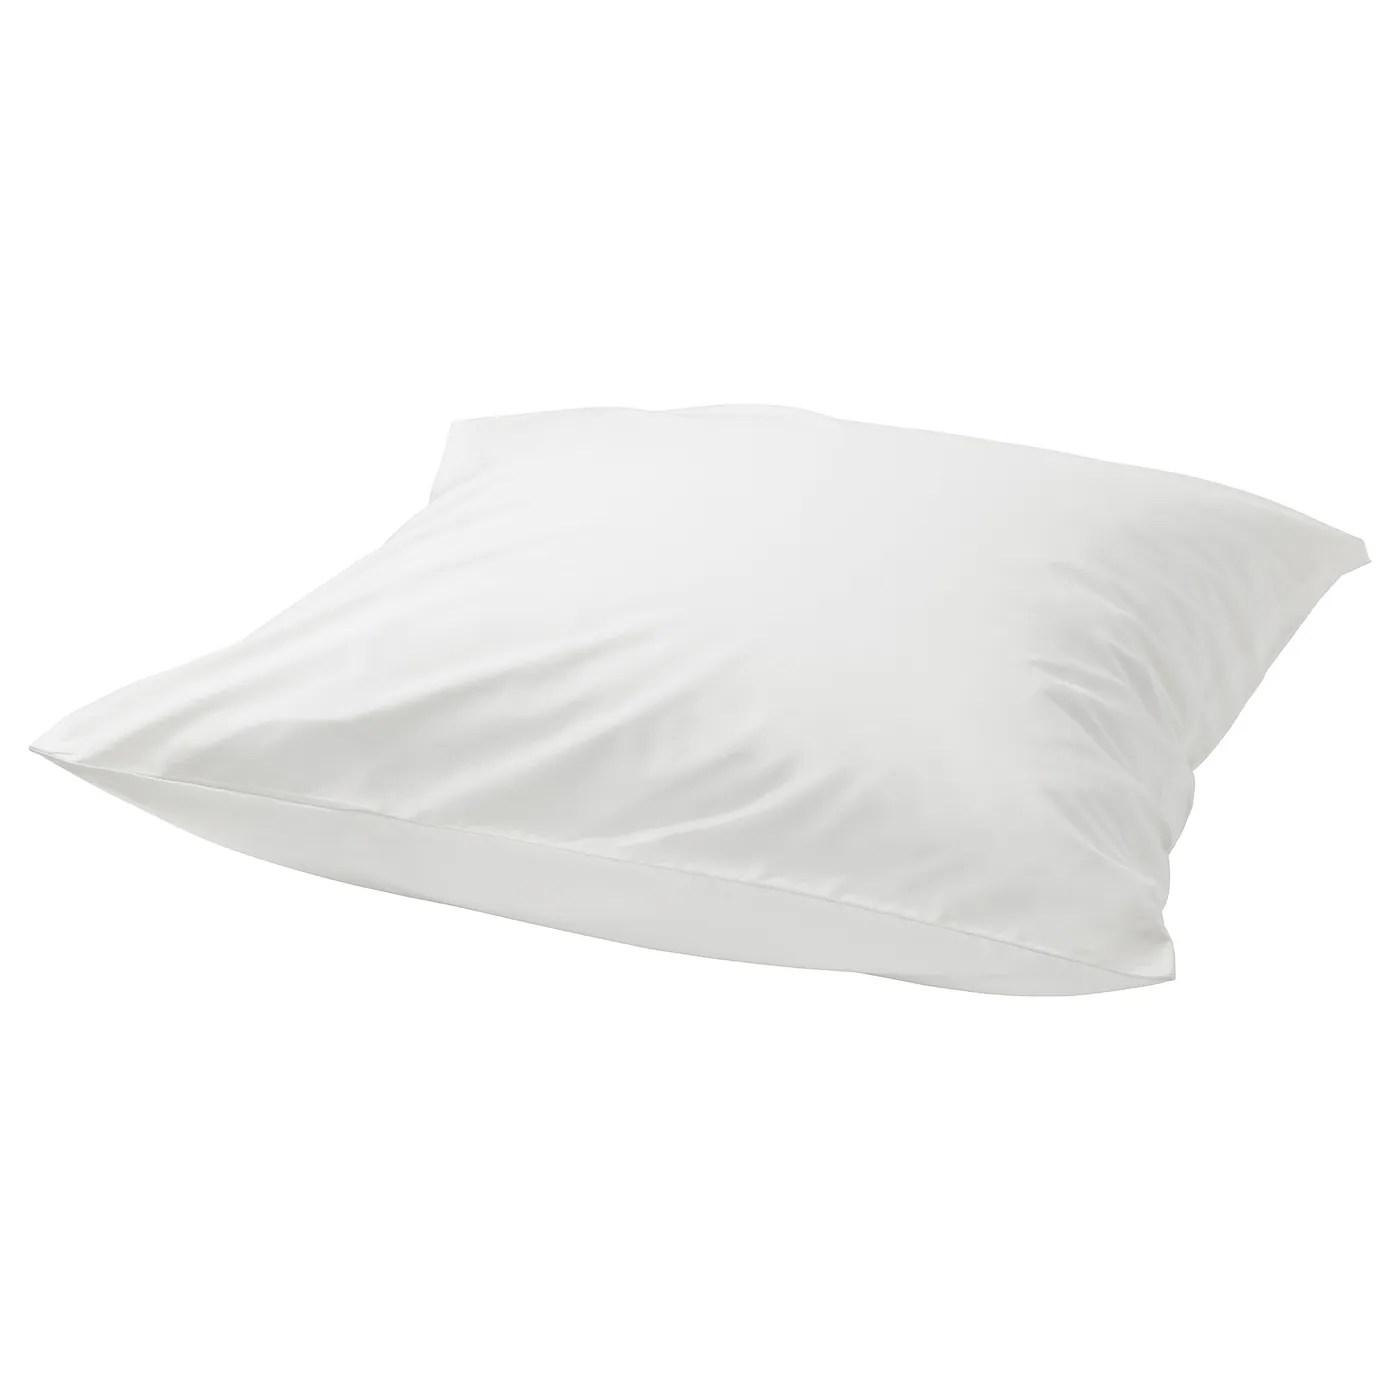 Ullvide Taie D Oreiller Blanc 65x65 Cm Ikea